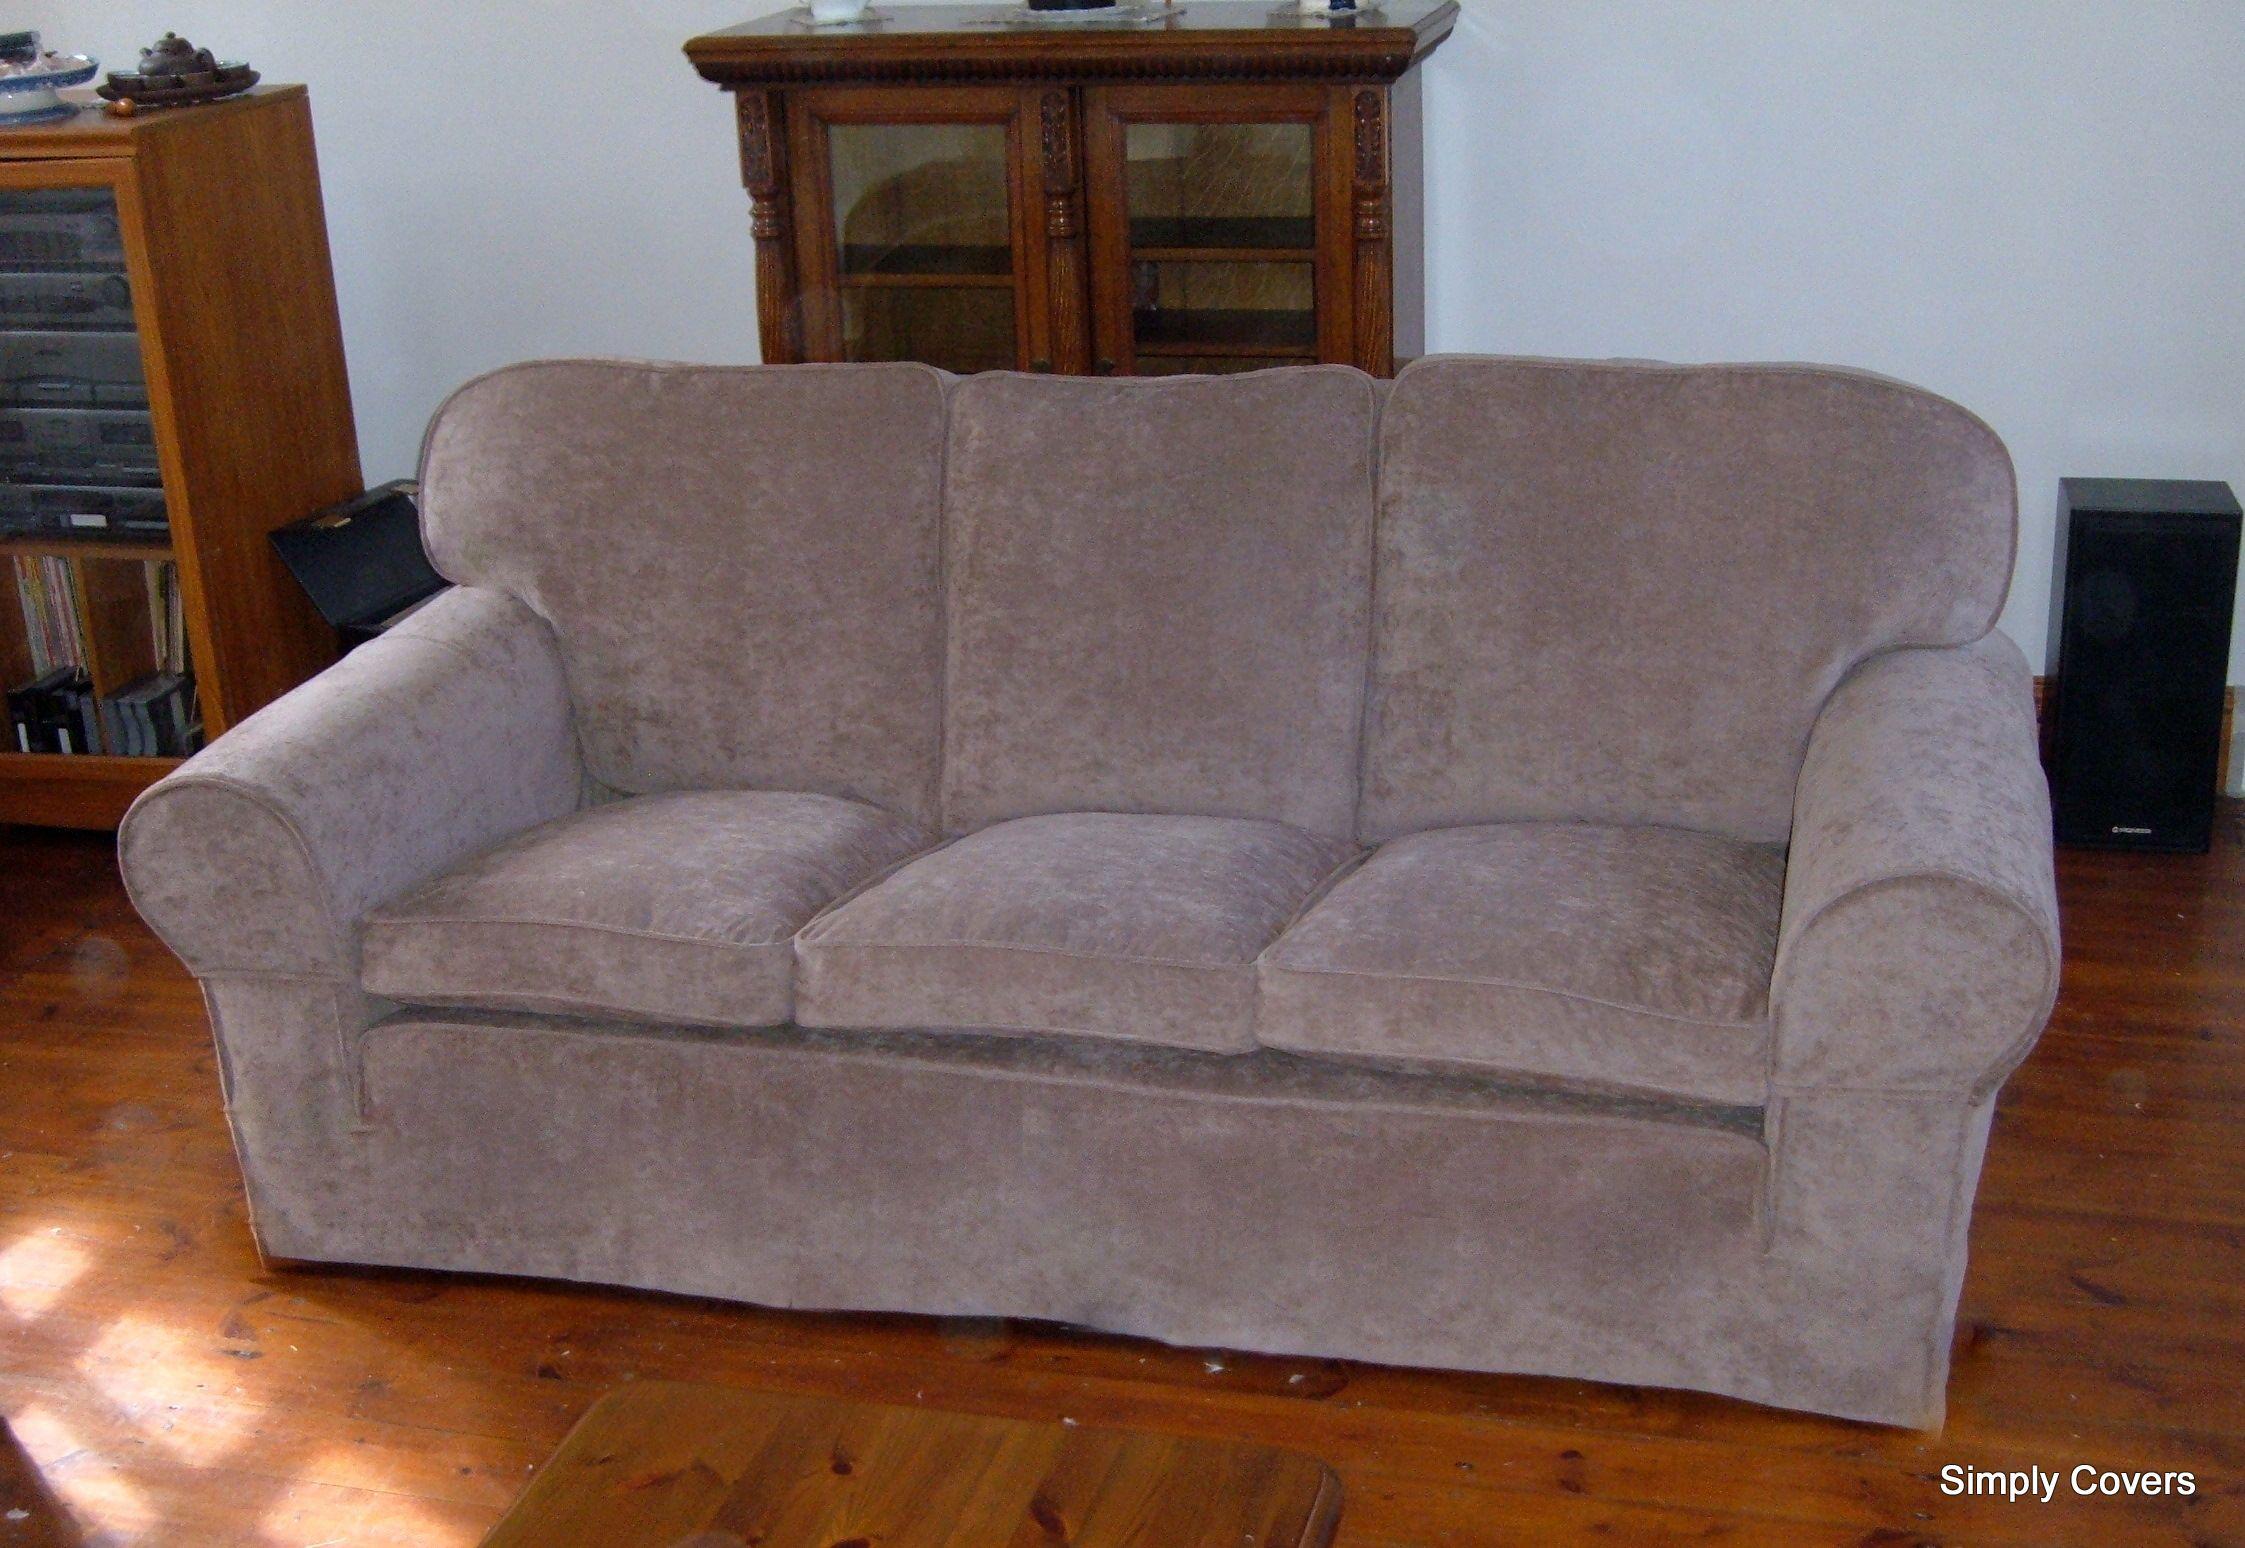 Stanton Sofa With Images Leather Sofa Covers Sofa Leather Sofa